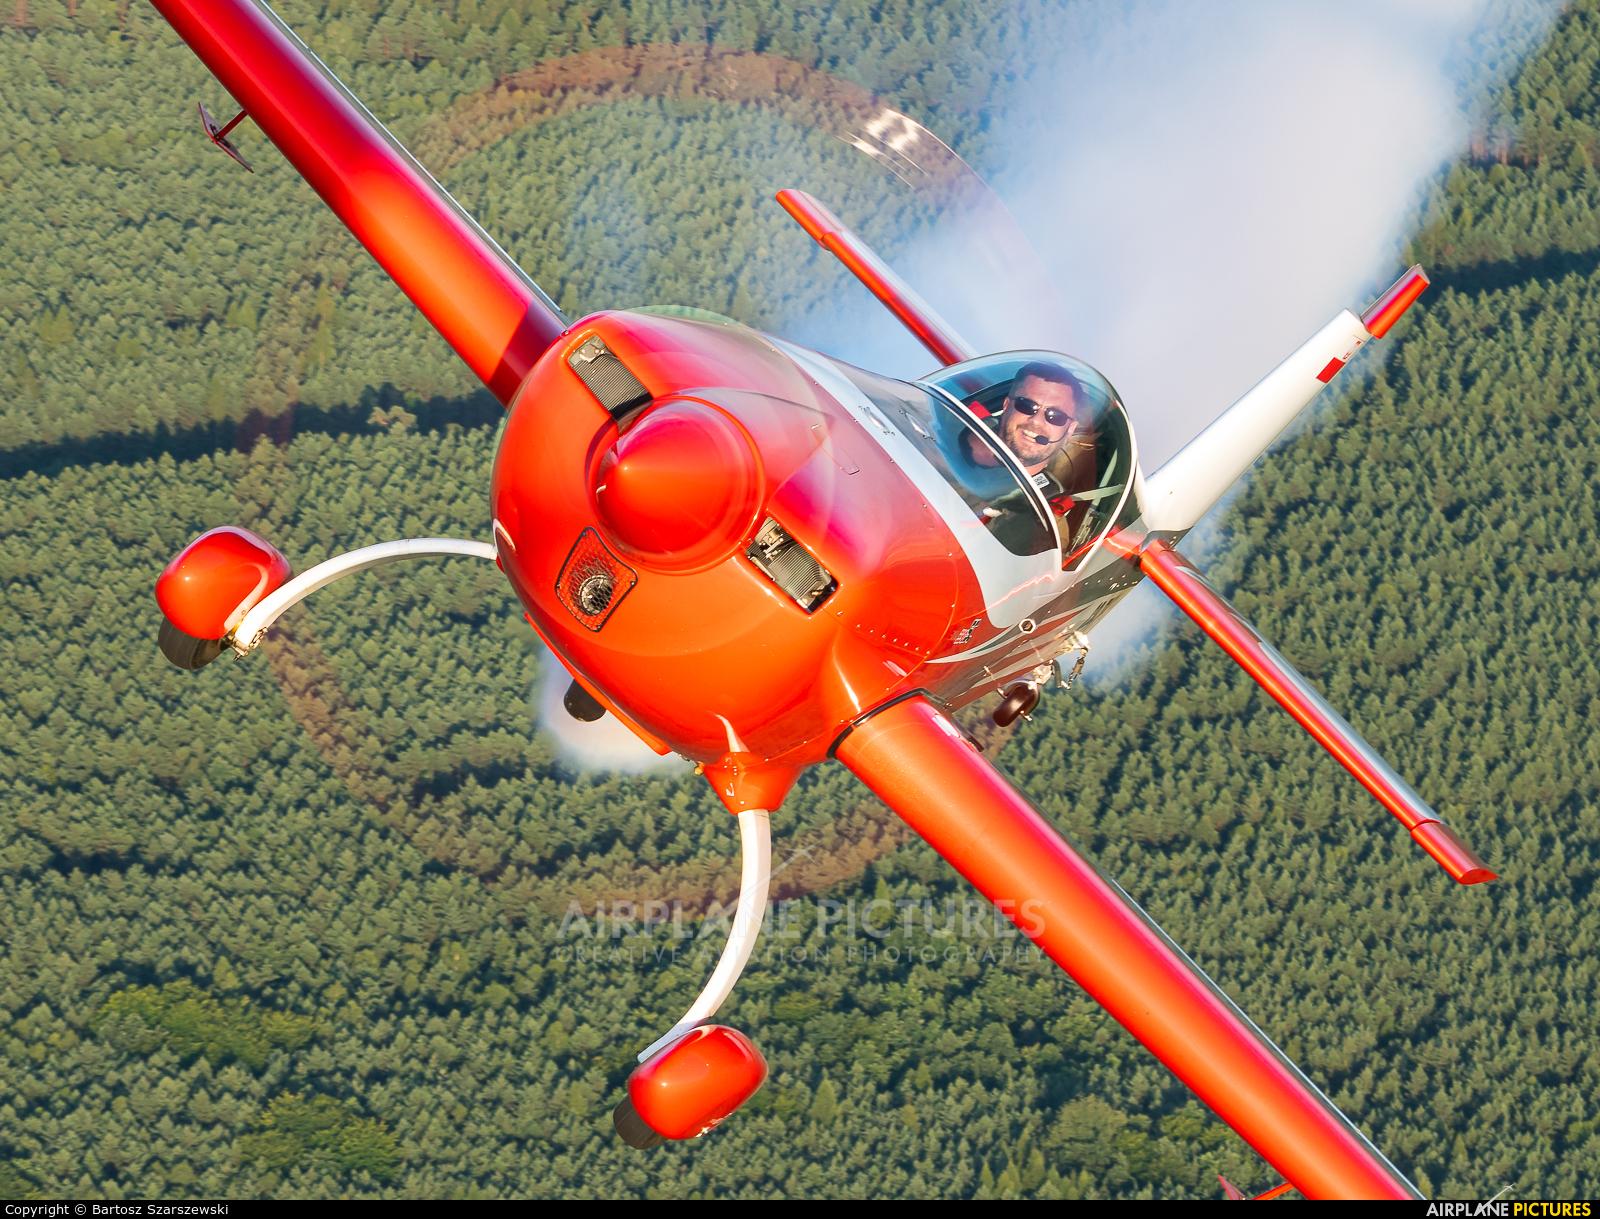 Firebirds Aerobatic Team SP-TLB aircraft at Piotrków Trybunalski